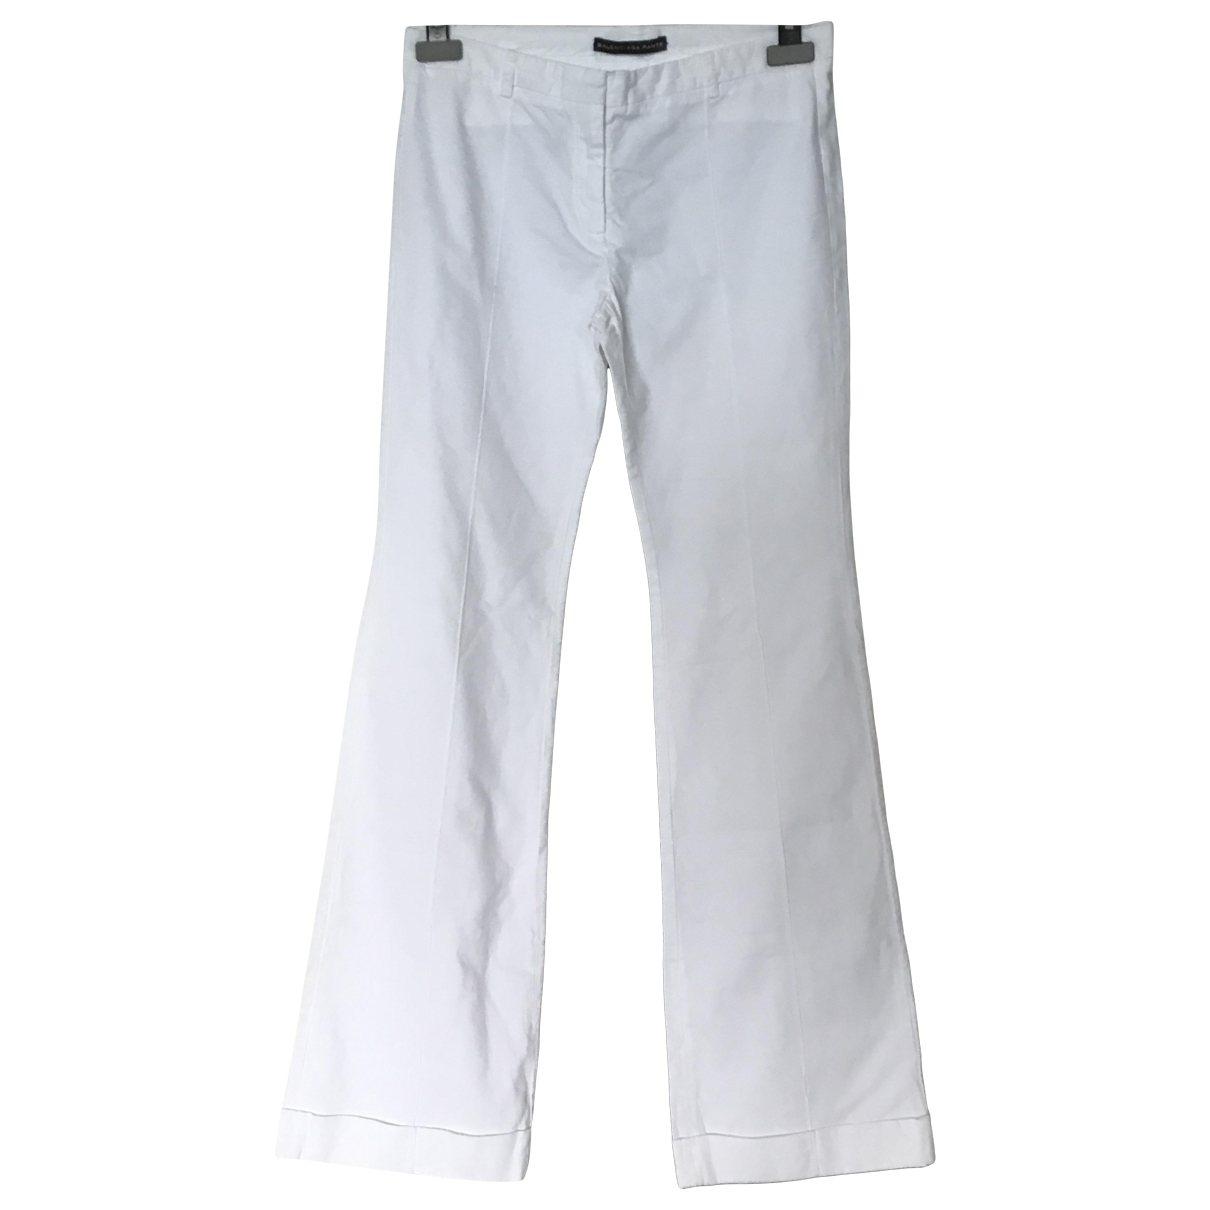 Balenciaga \N White Denim - Jeans Trousers for Women 38 FR